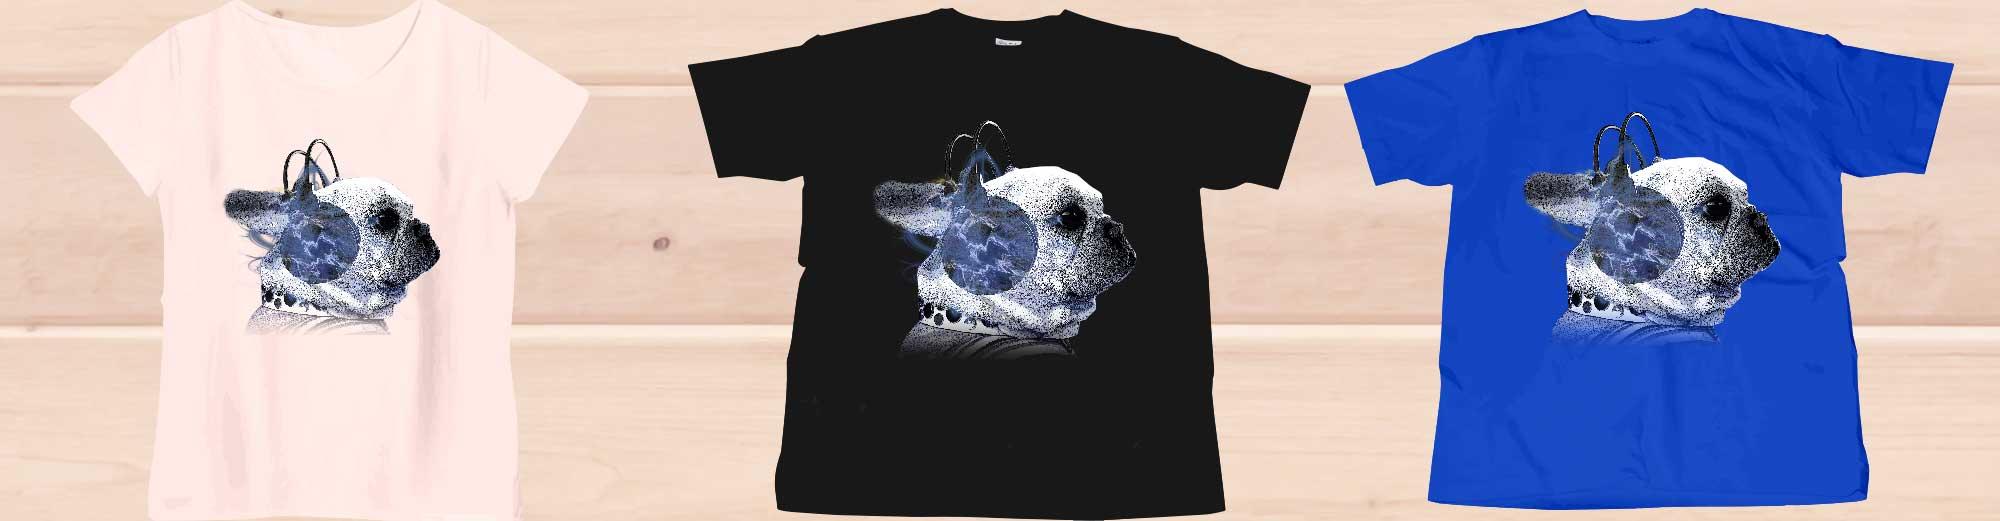 funnyfrenchヘッドホンフレンチブルドッグのTシャツ